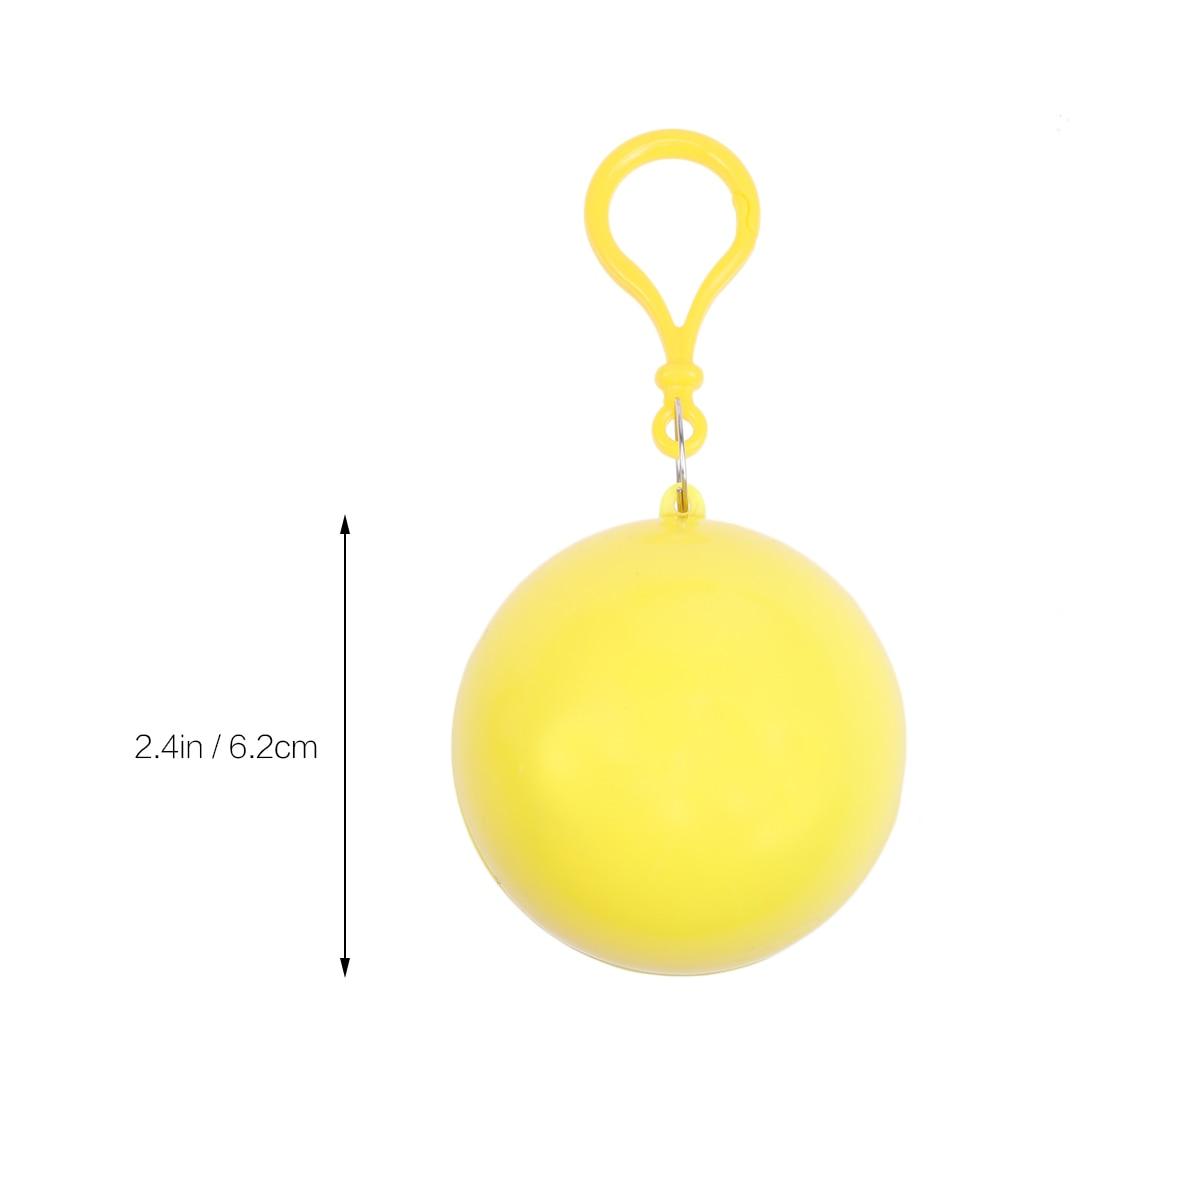 Creative Rainwear Raincoat Disposable Camping Rain Poncho in a Ball Keychain /%Y*